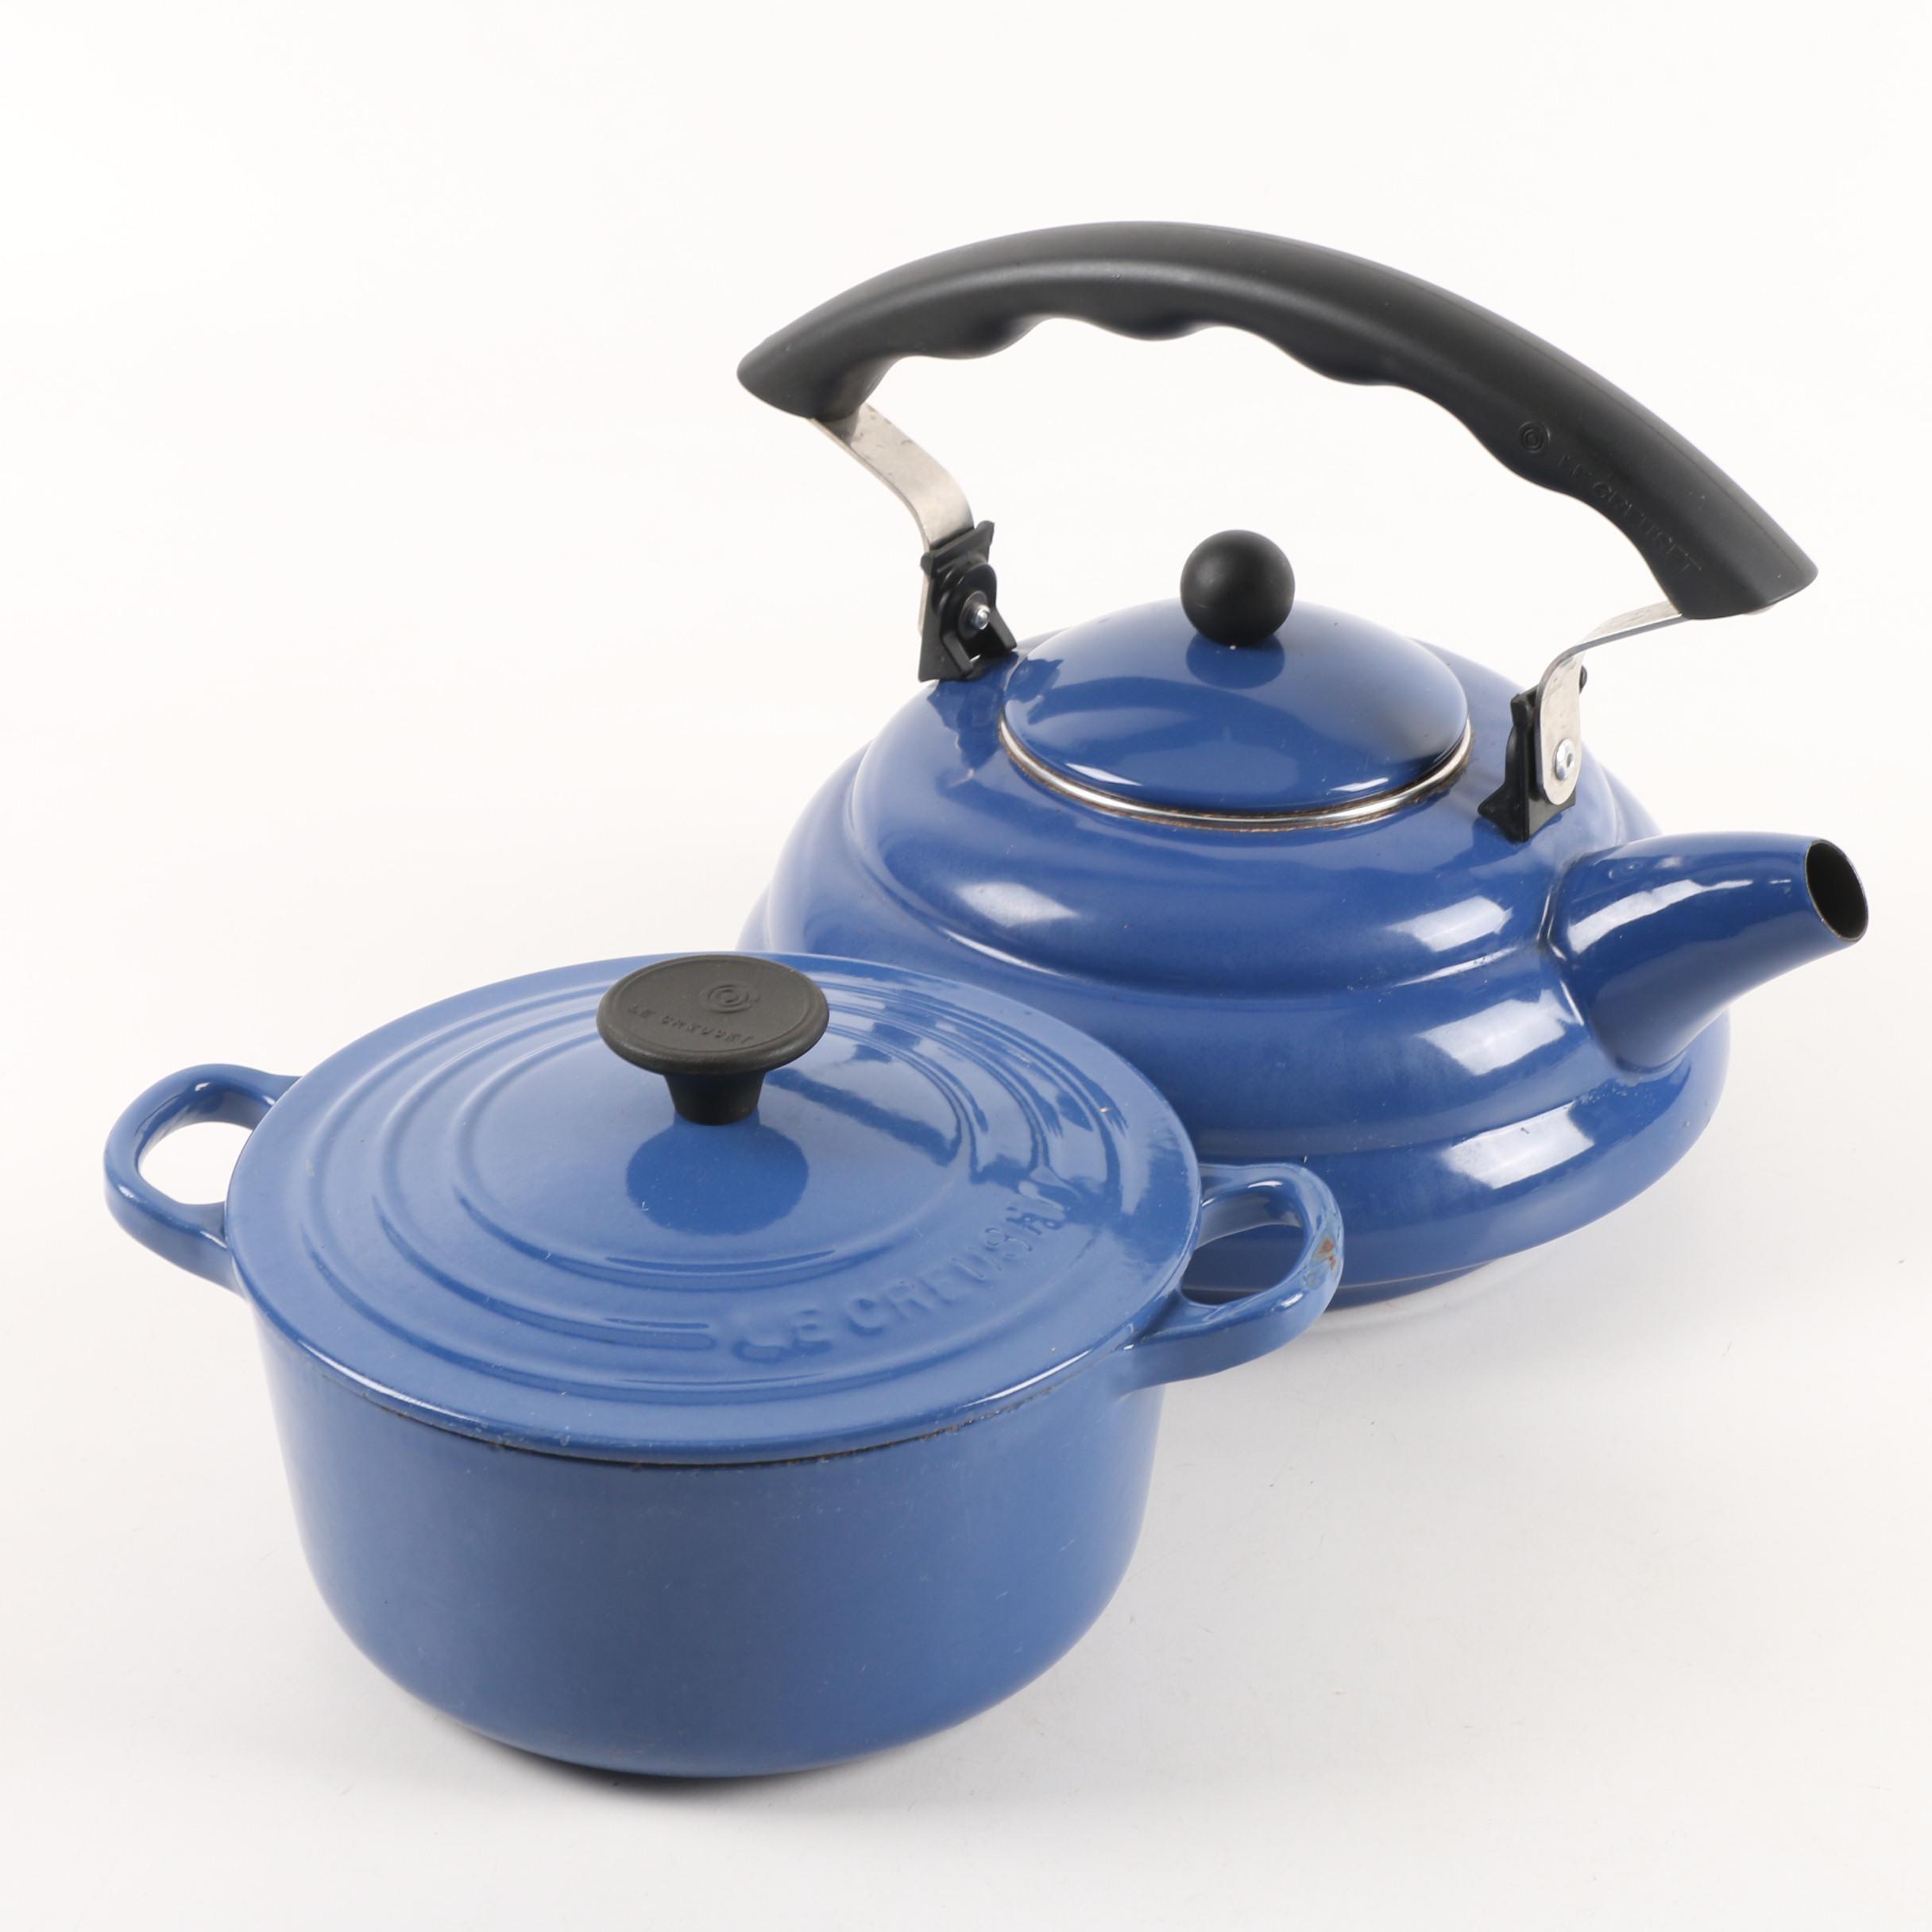 Le Creuset Blue Enameled Tea Kettle and Dutch Oven